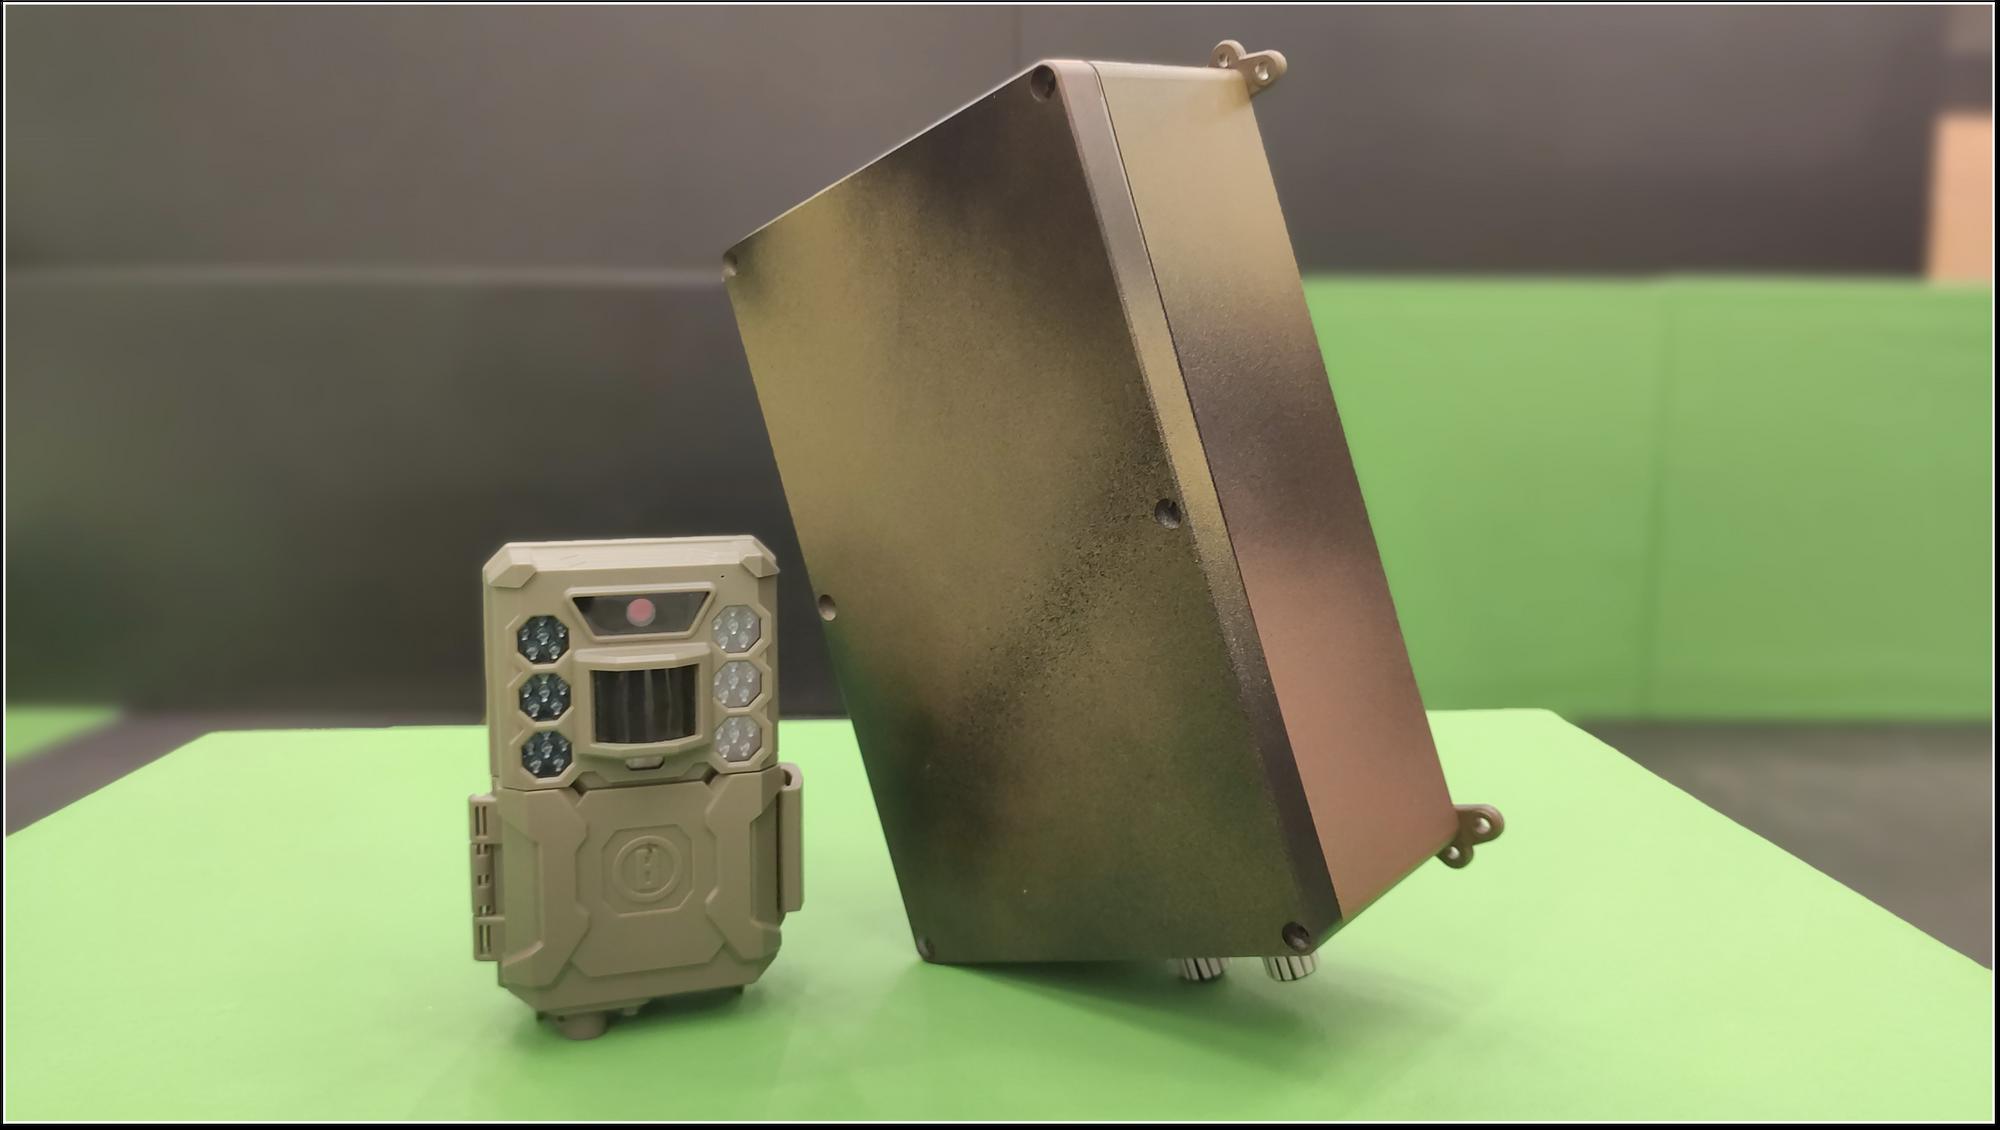 Modified Bushnell camera trap and our custom Smart Bridge hardware